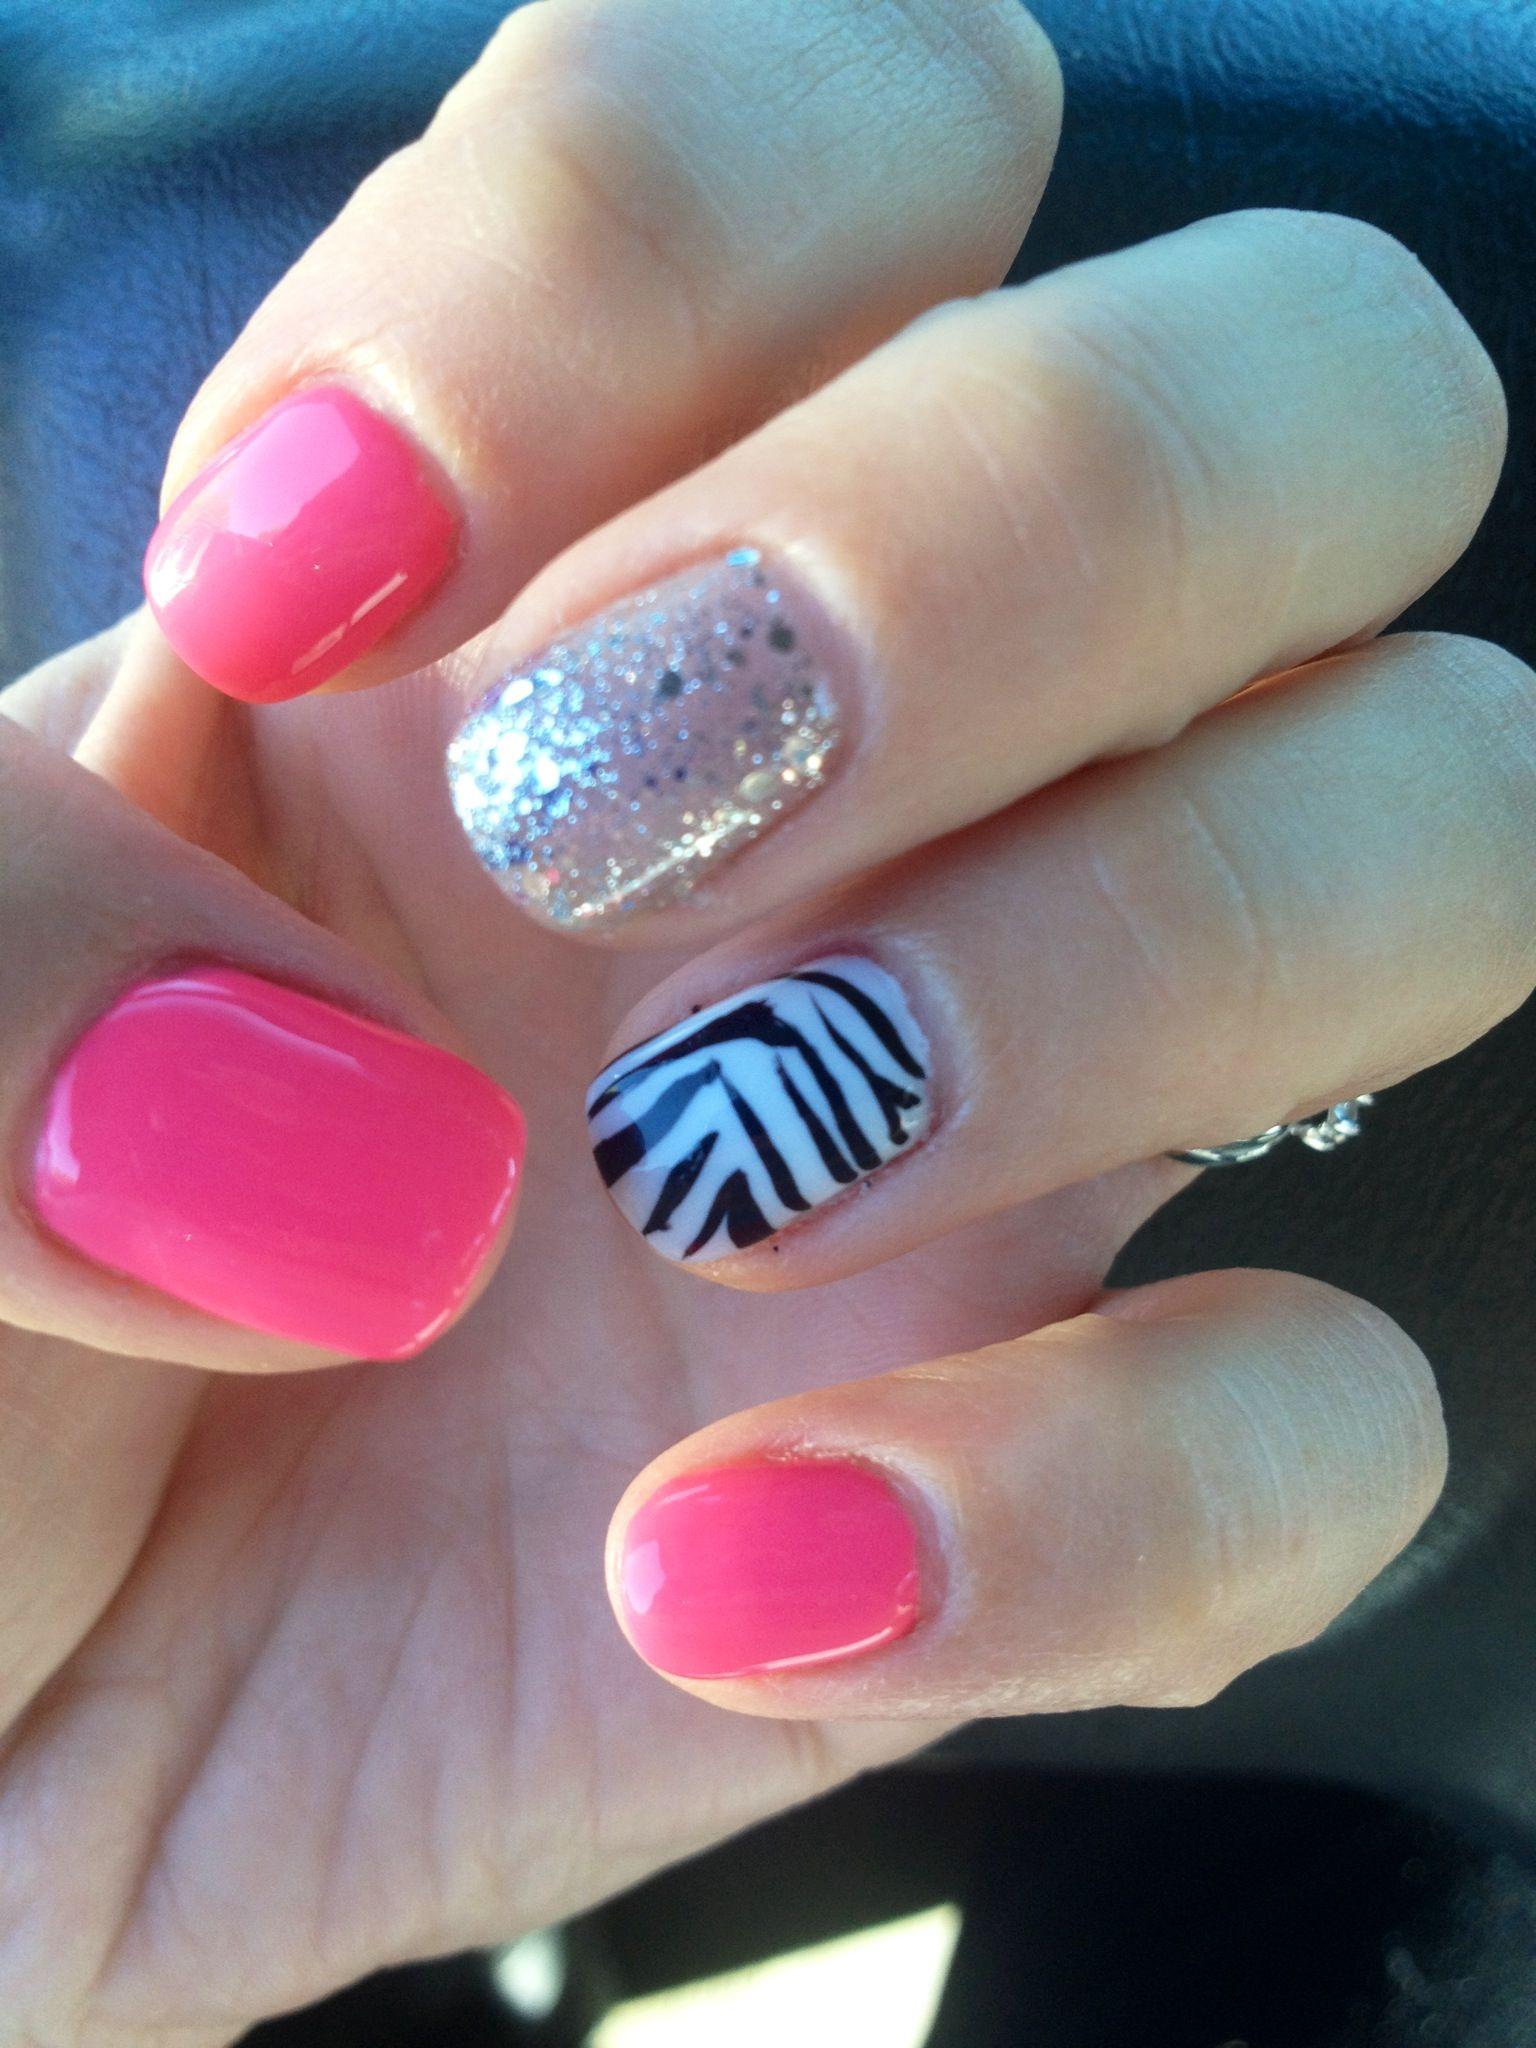 Pink zebra nails nails pinterest - Glitter Pink Shellac Gelling Cute Nails Zebra Sparkle Design